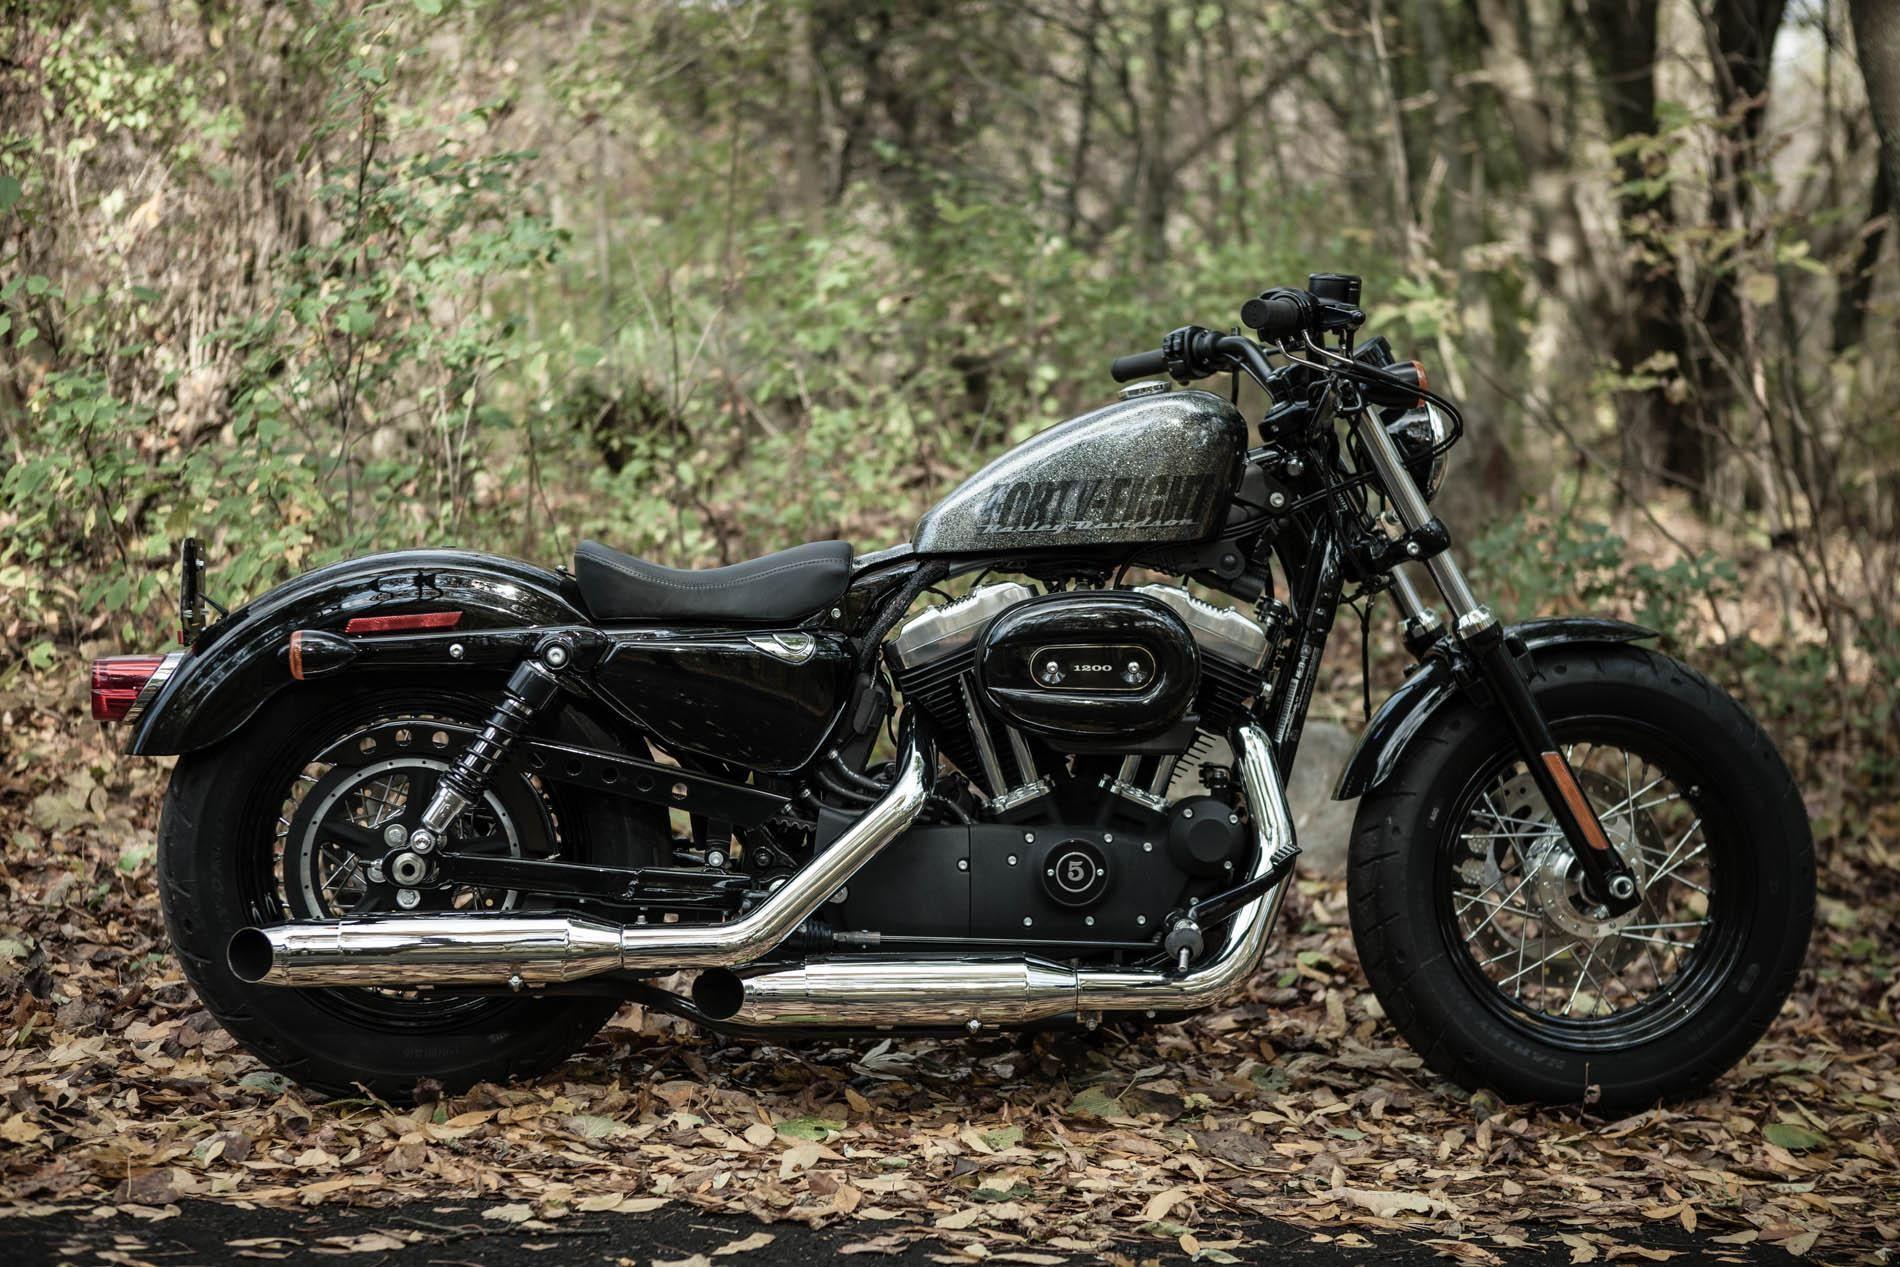 2014 Harley Davidson Sportster Forty Eight Blogpost Eatsleepride